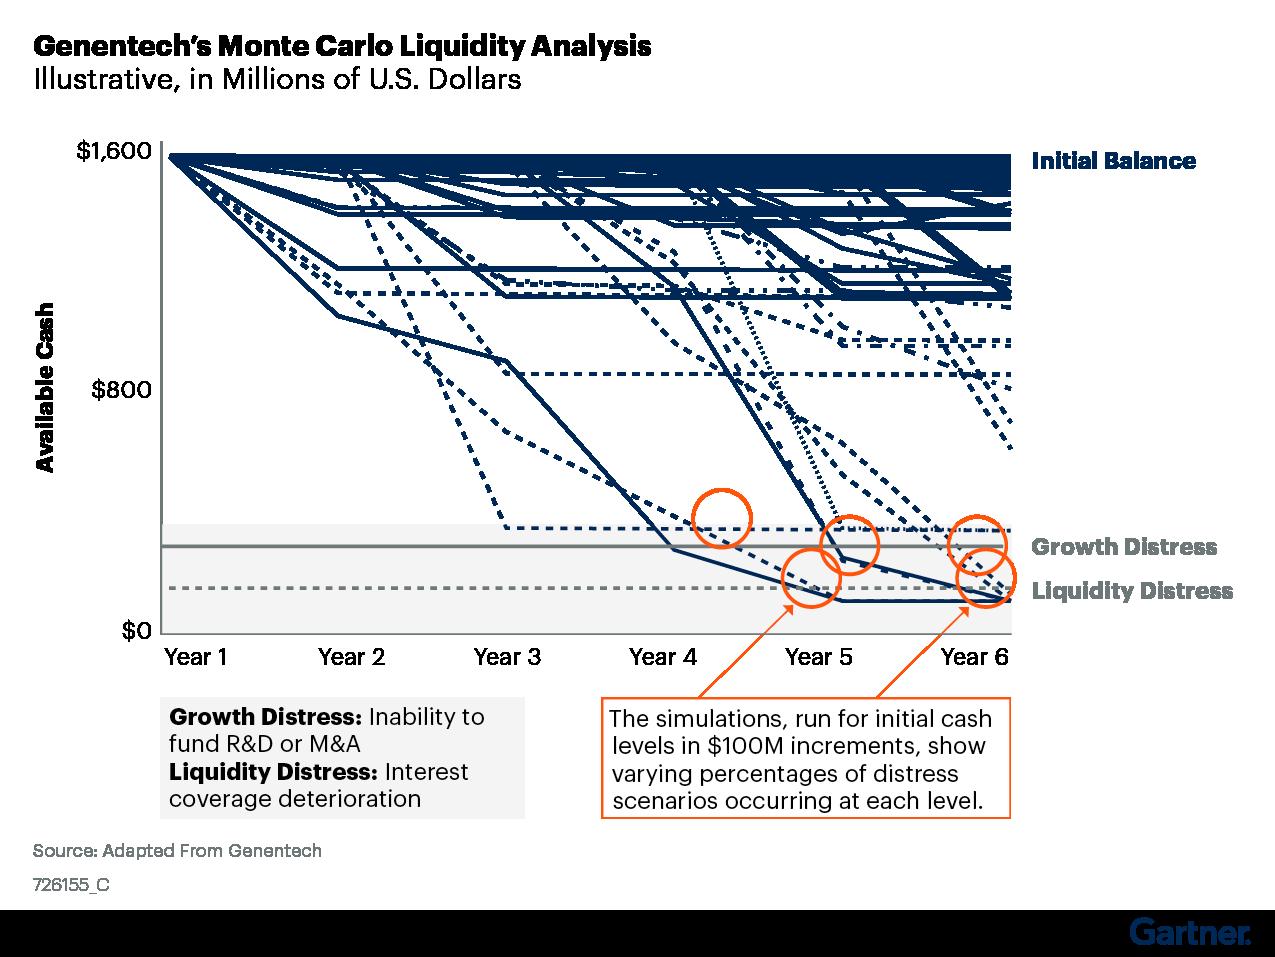 Figure 1. Genentech's Monte Carlo Liquidity Analysis